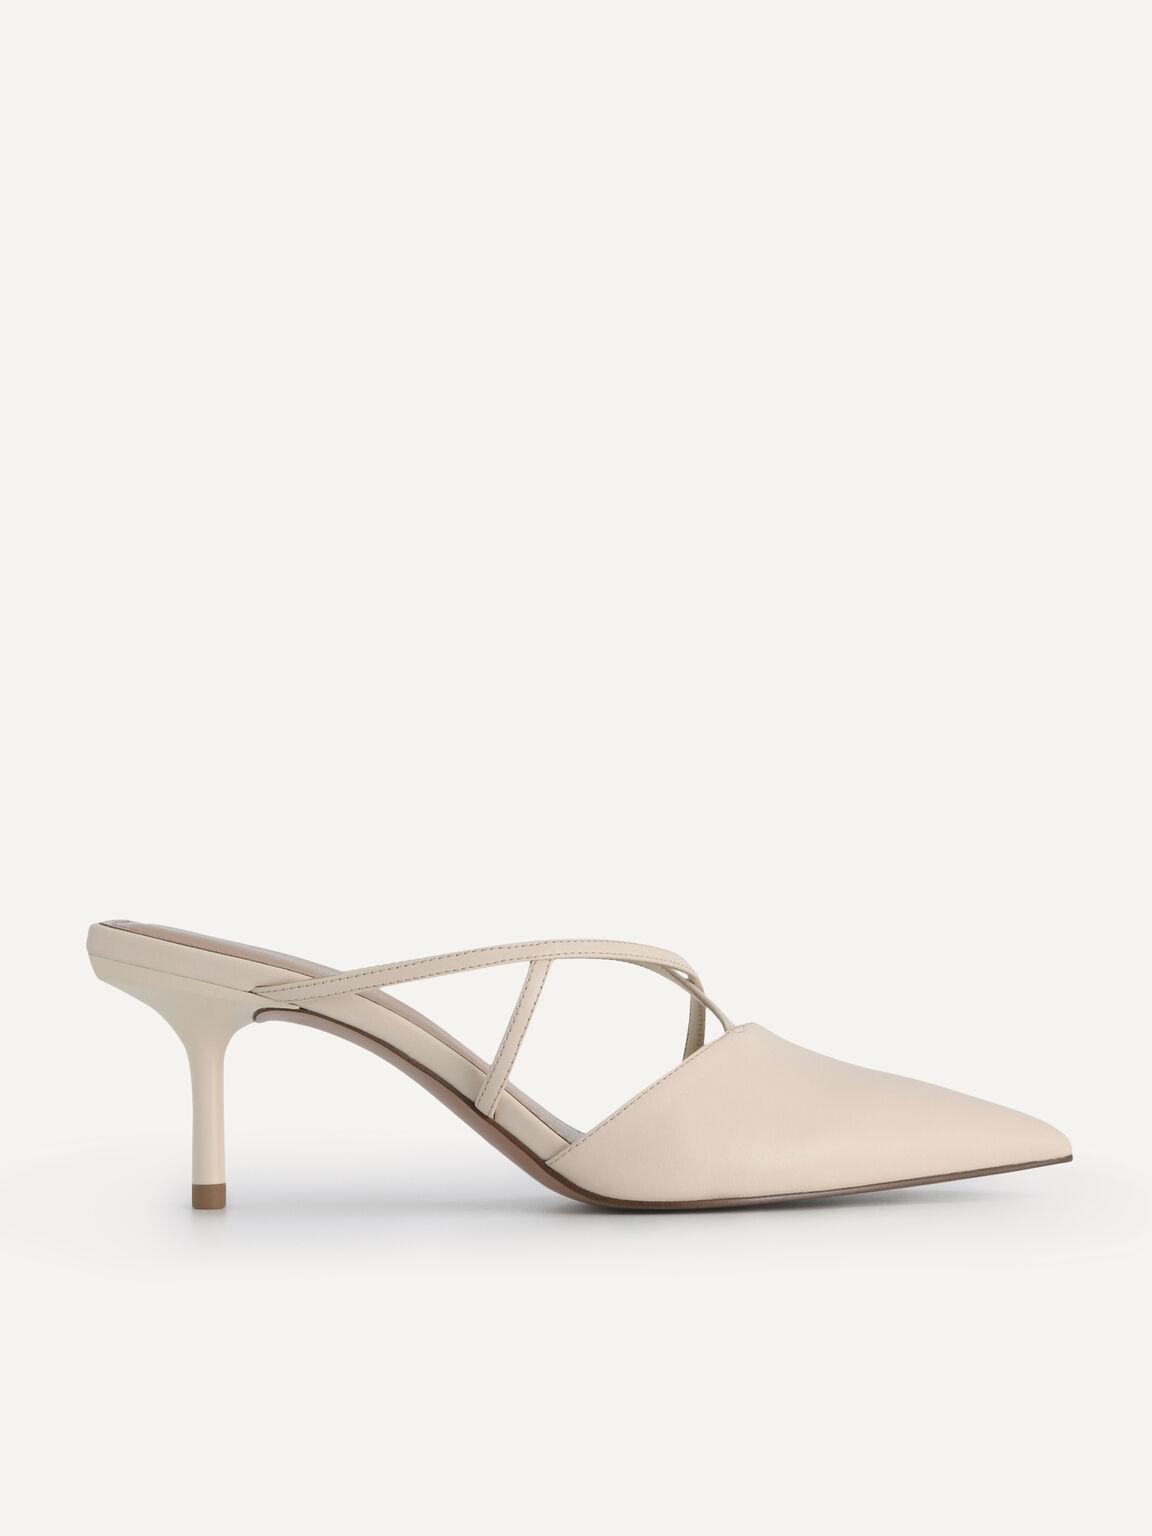 Pointed Toe Leather Heels, Beige, hi-res